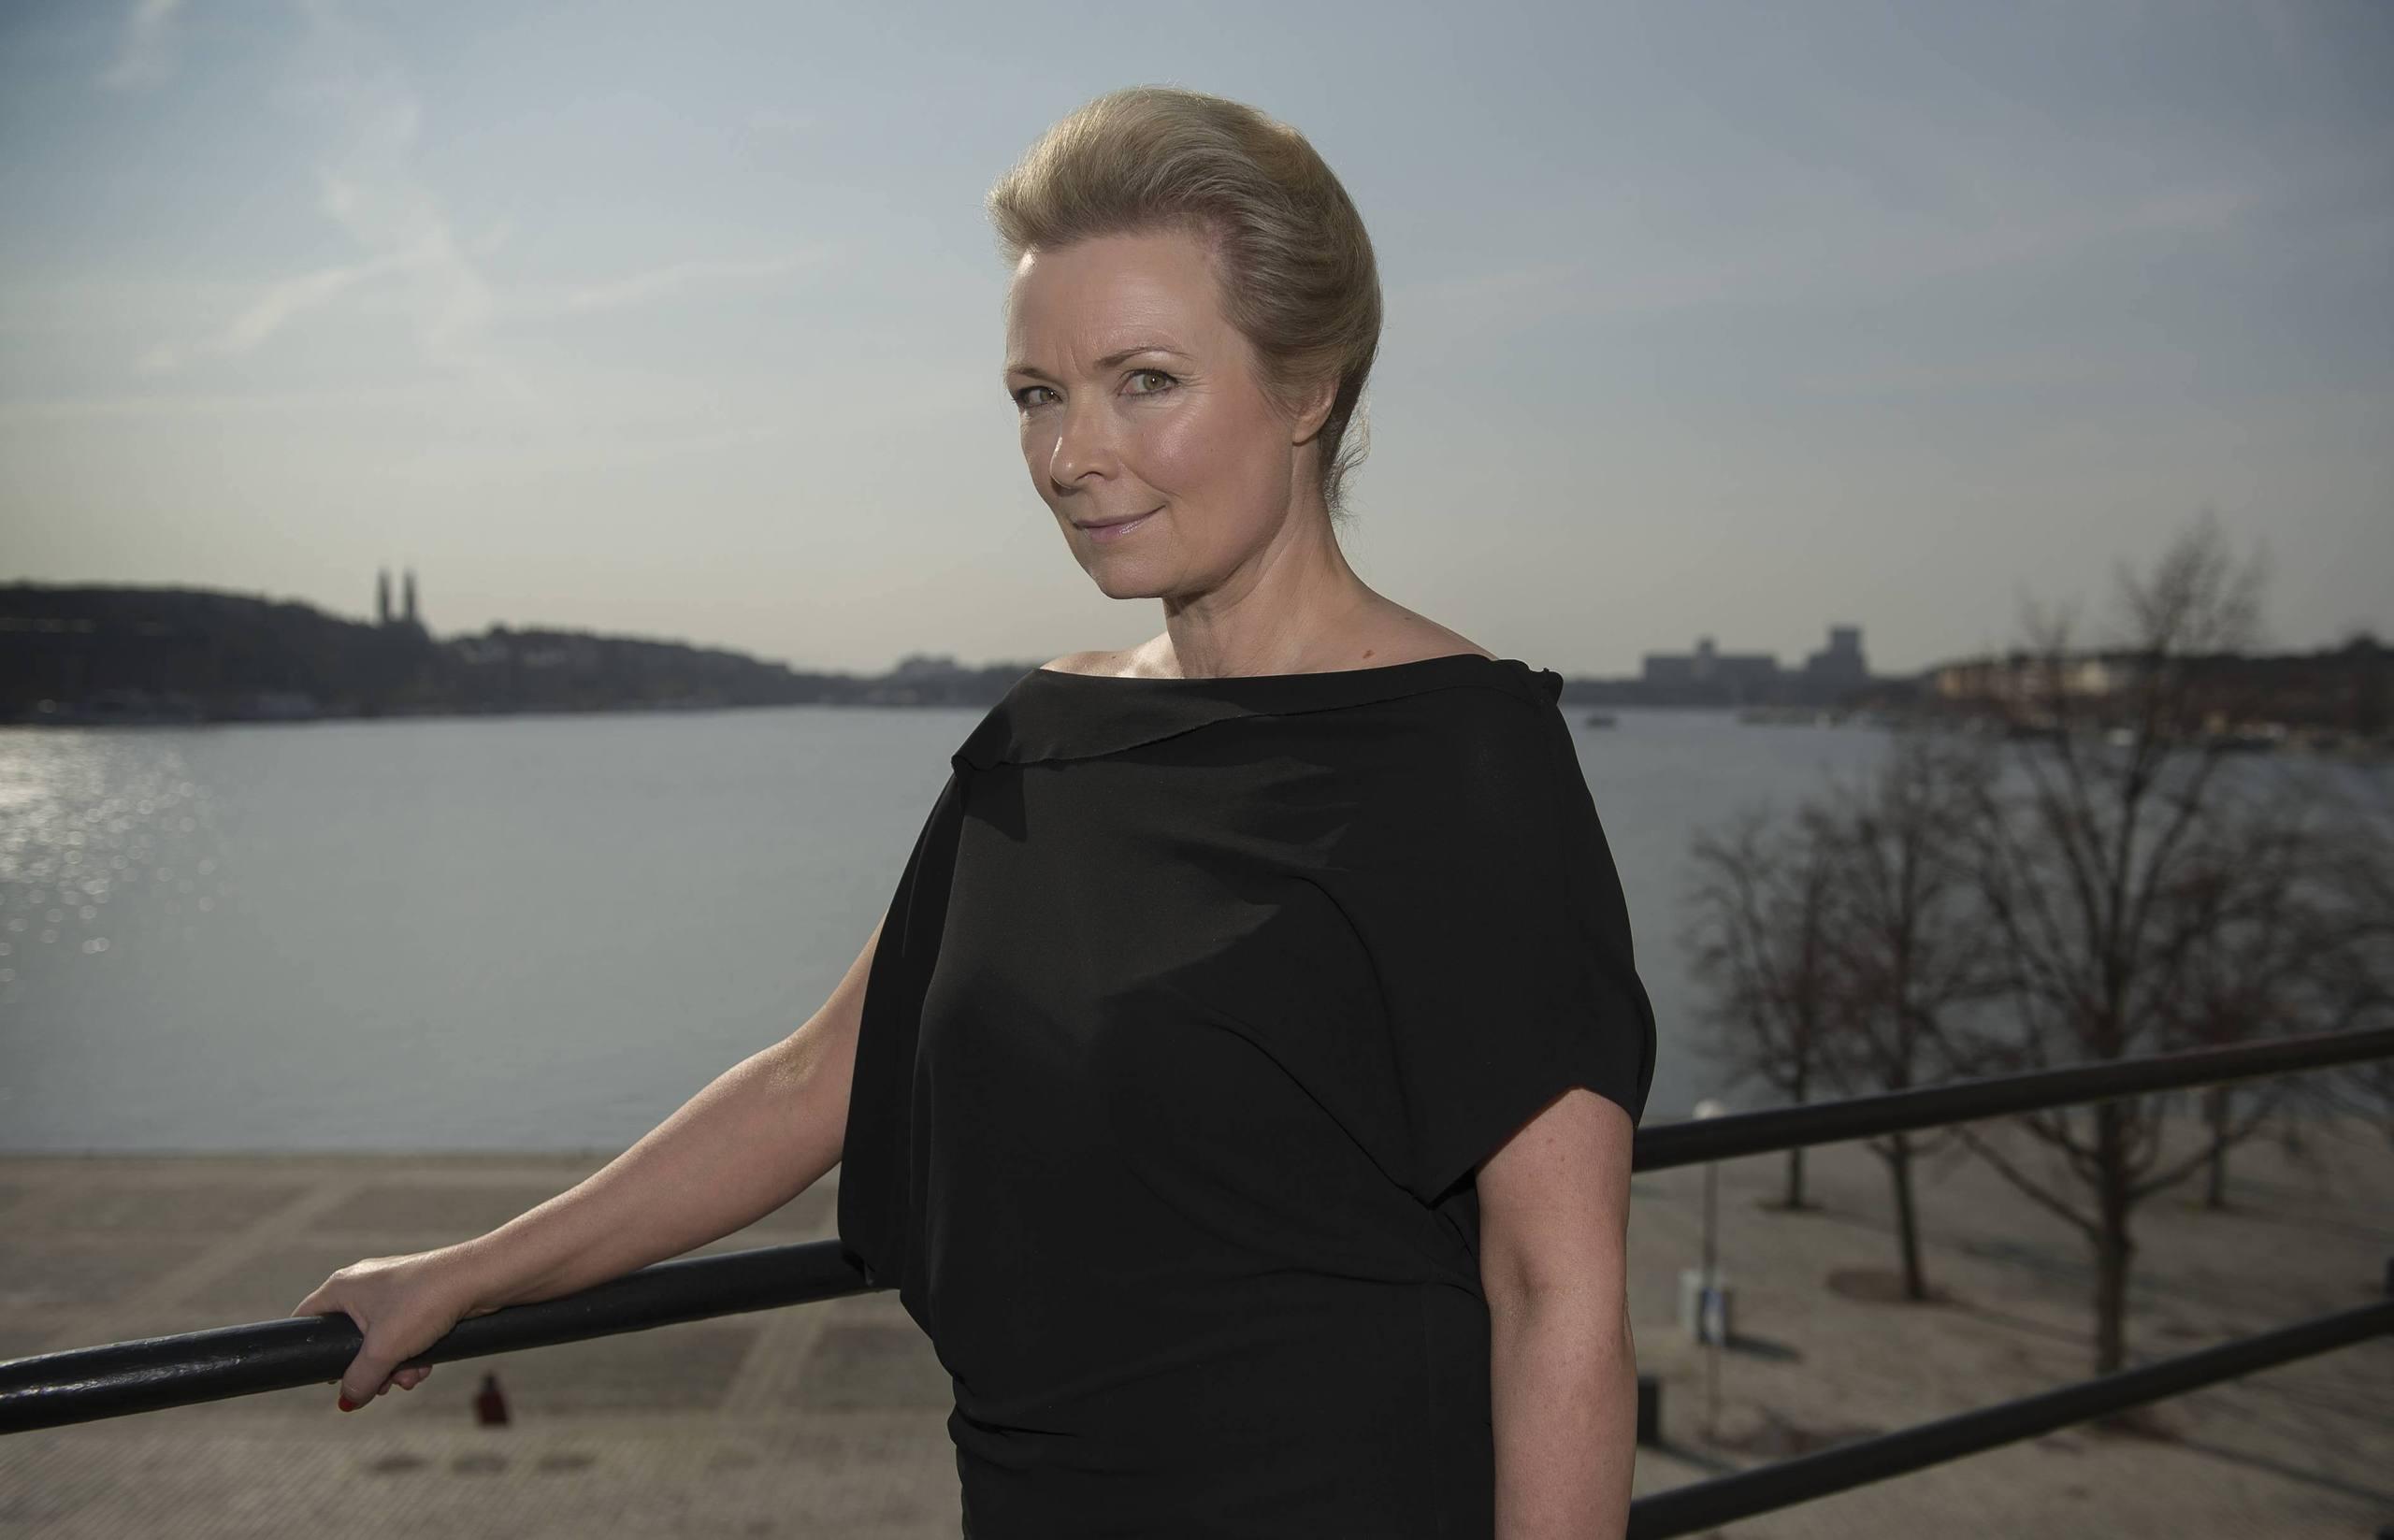 snapchat ledsagare stort bröst i stockholm